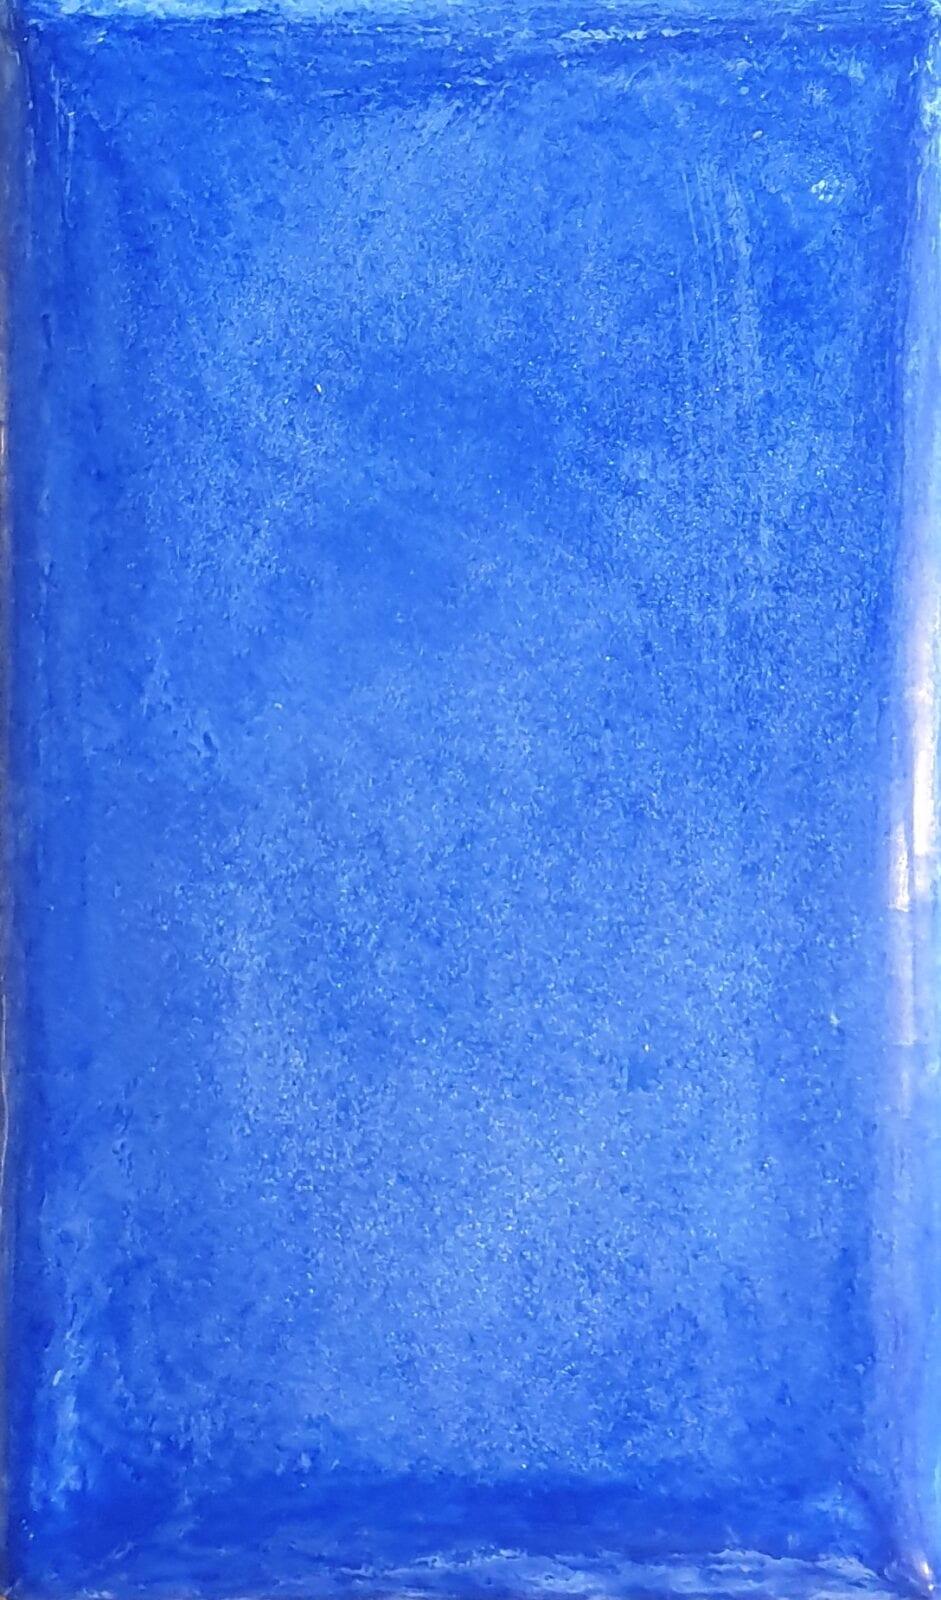 Tadelakt kleuren Ultramarijn Blauw